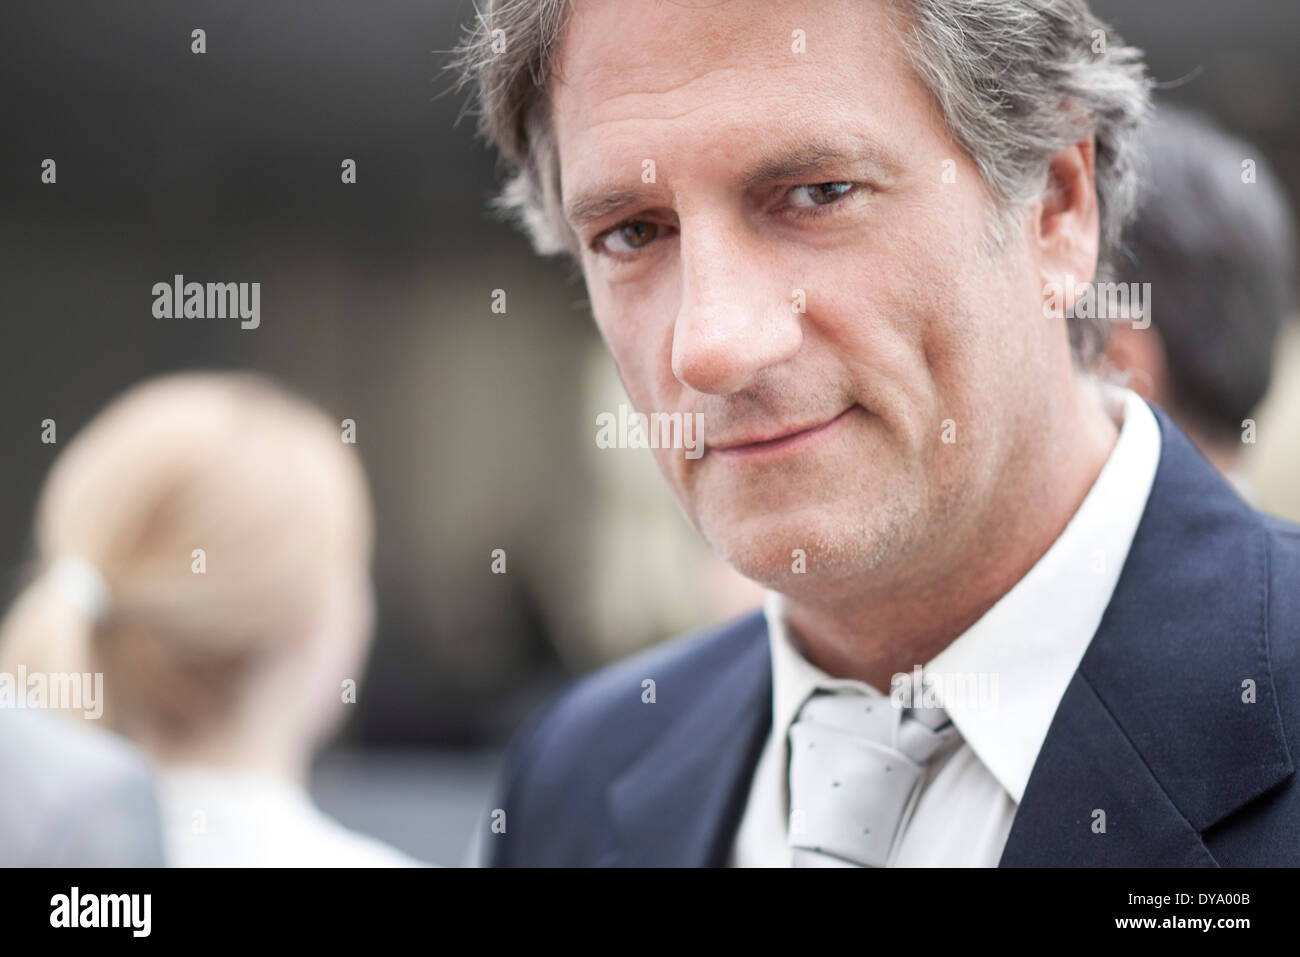 Business executive, portrait - Stock Image